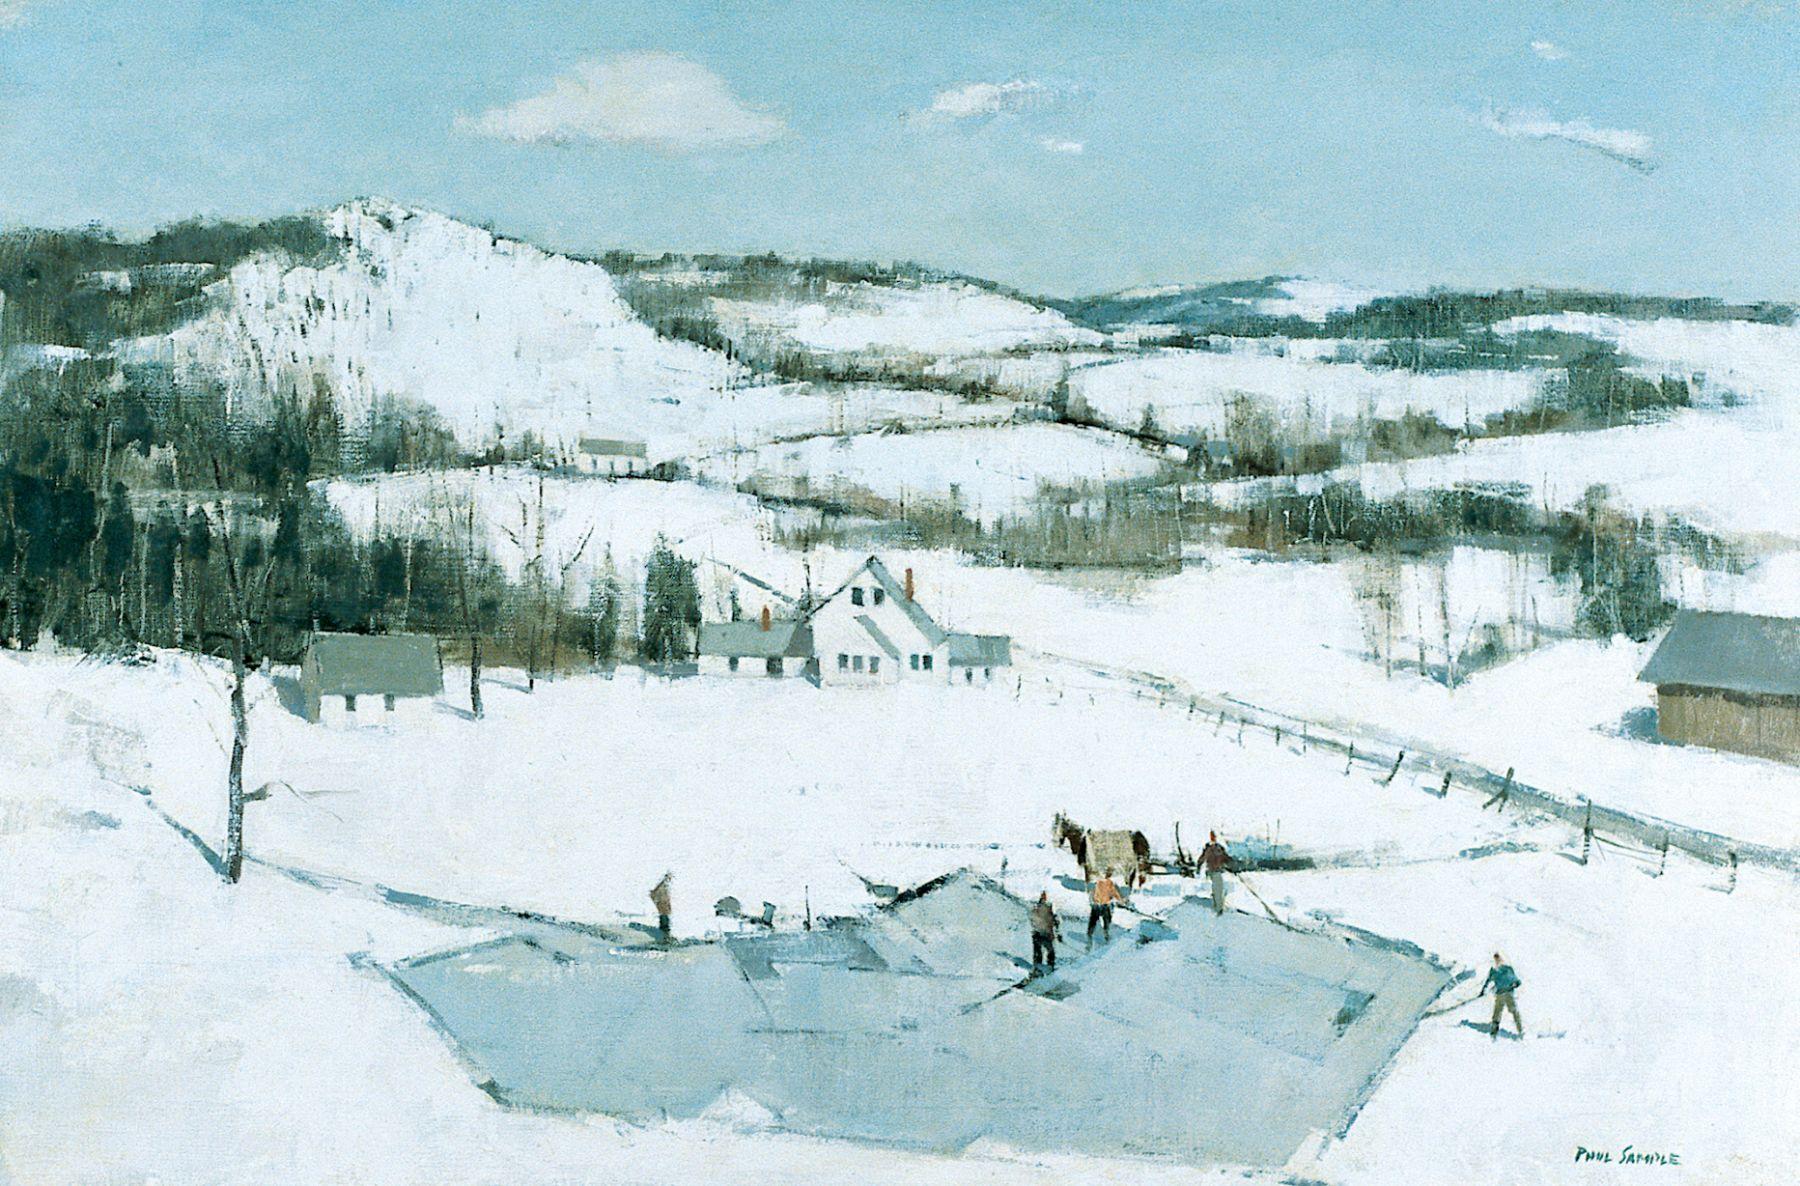 Paul Sample, Ice Cutting